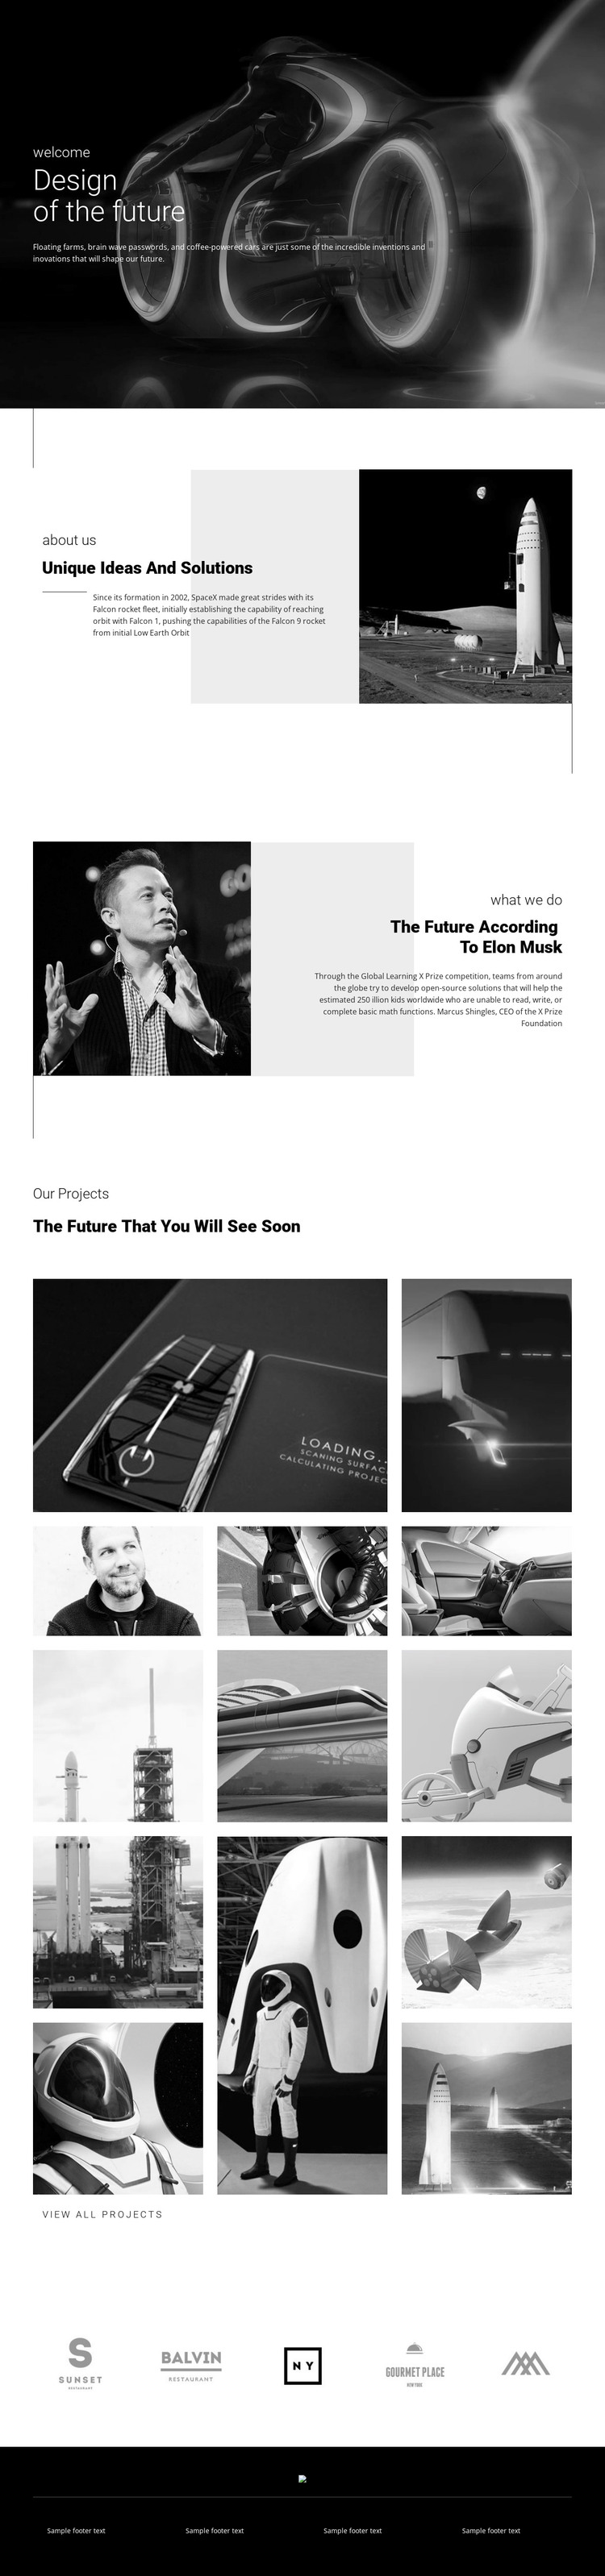 Design of future technology WordPress Theme